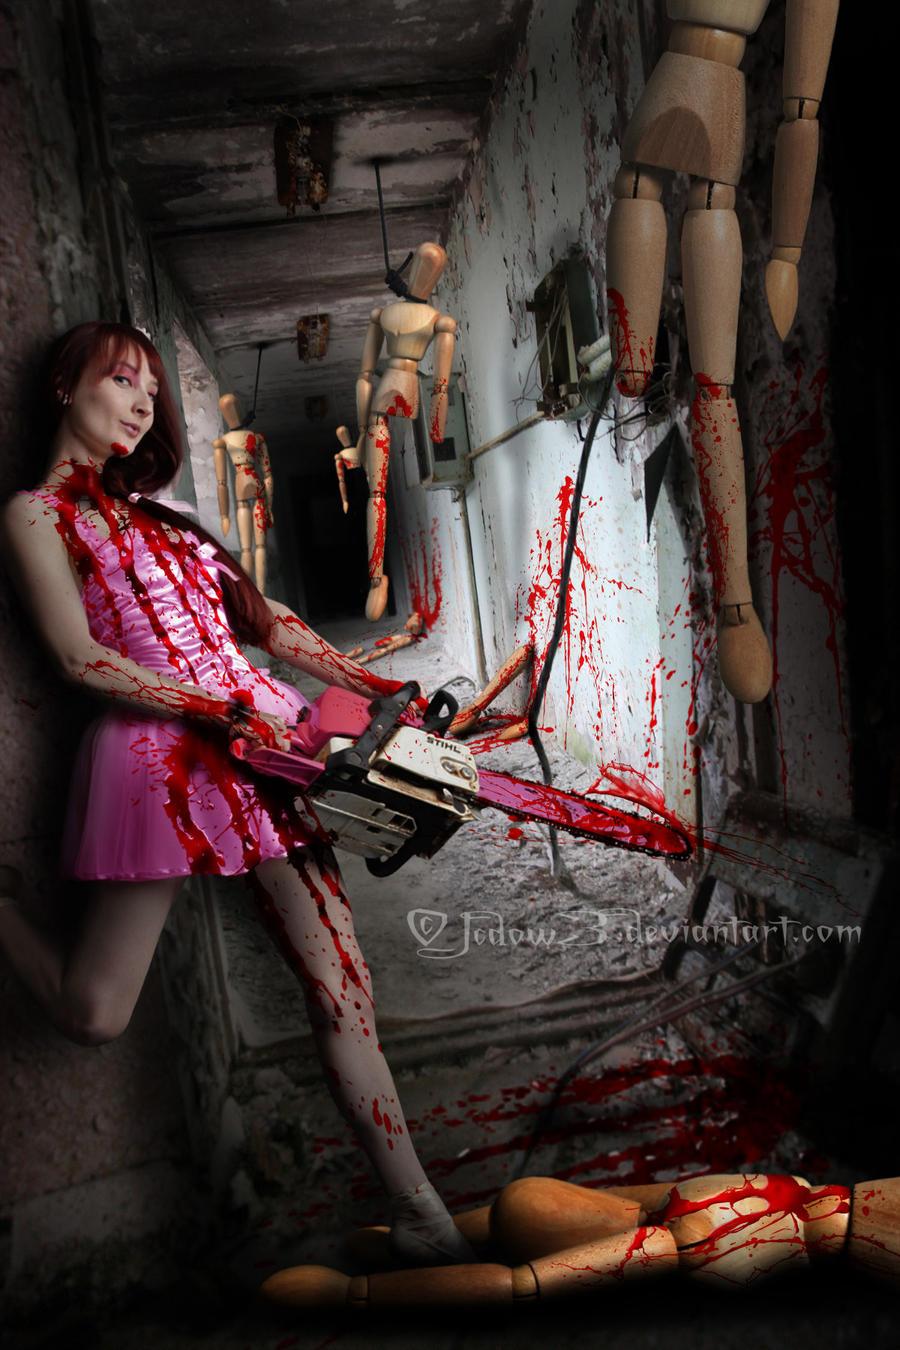 Chainsaw Killer ?